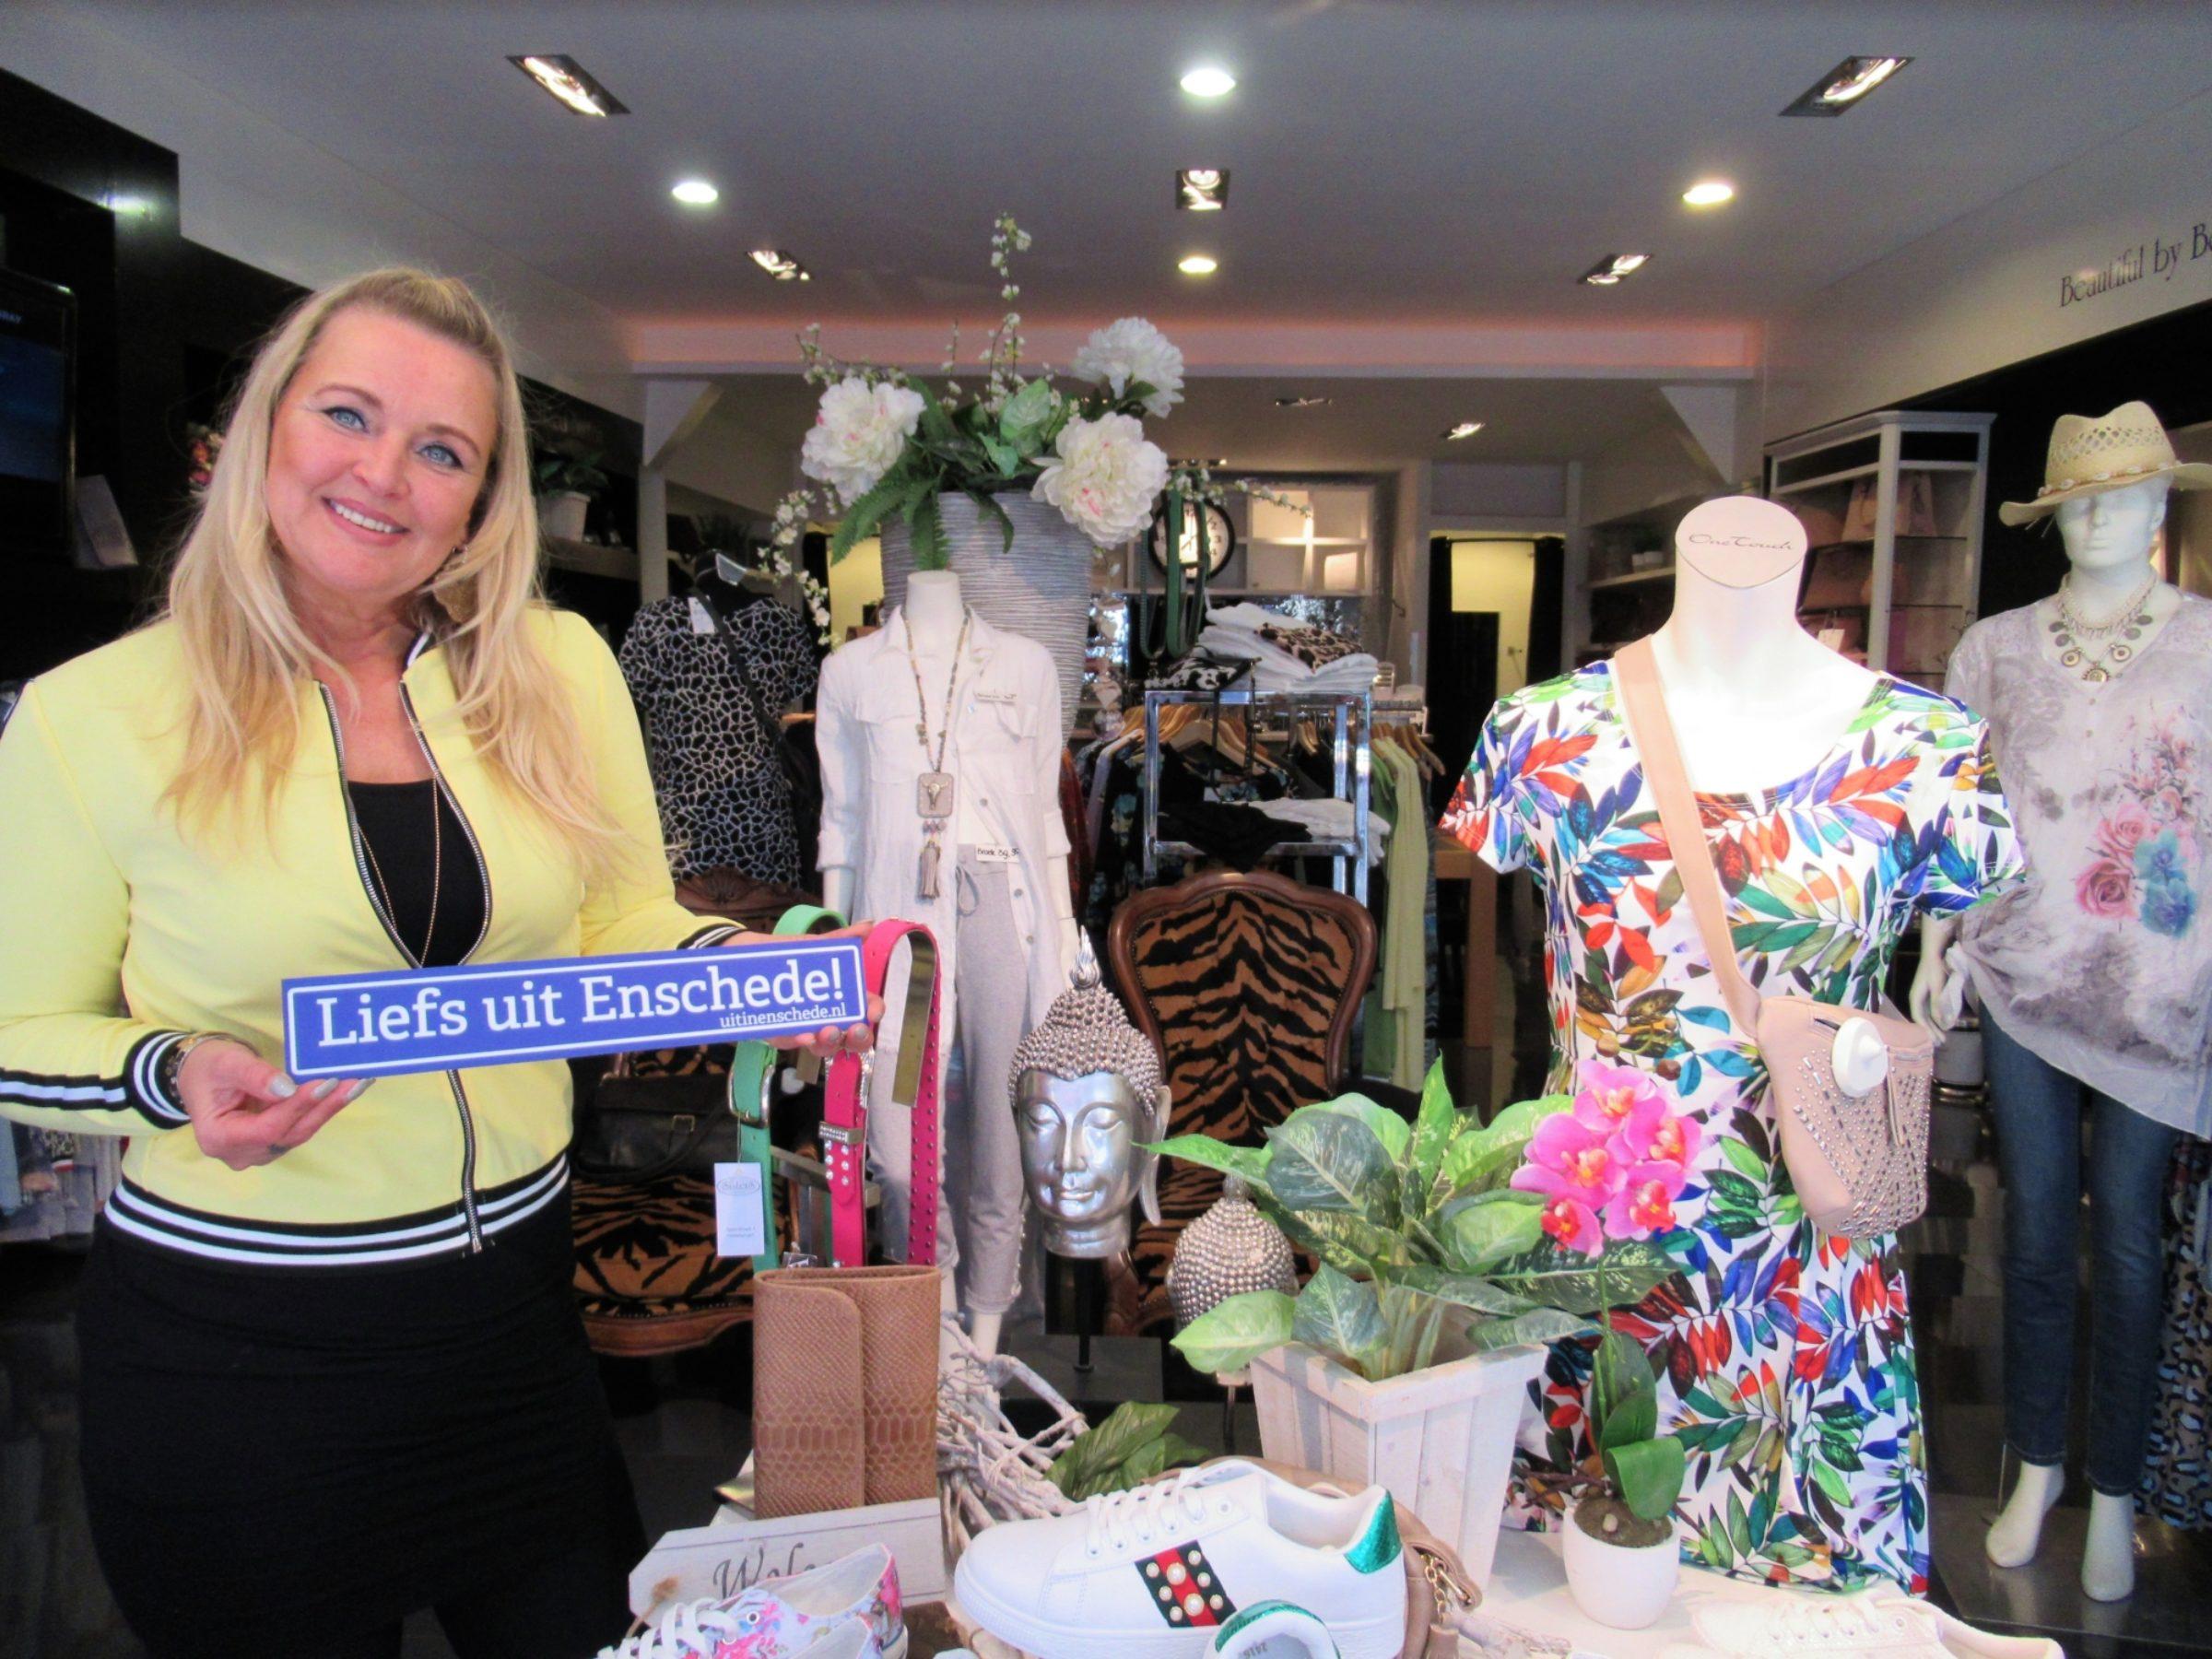 2018 Liefs Uit Enschede Sisters Marketing En Campagnes